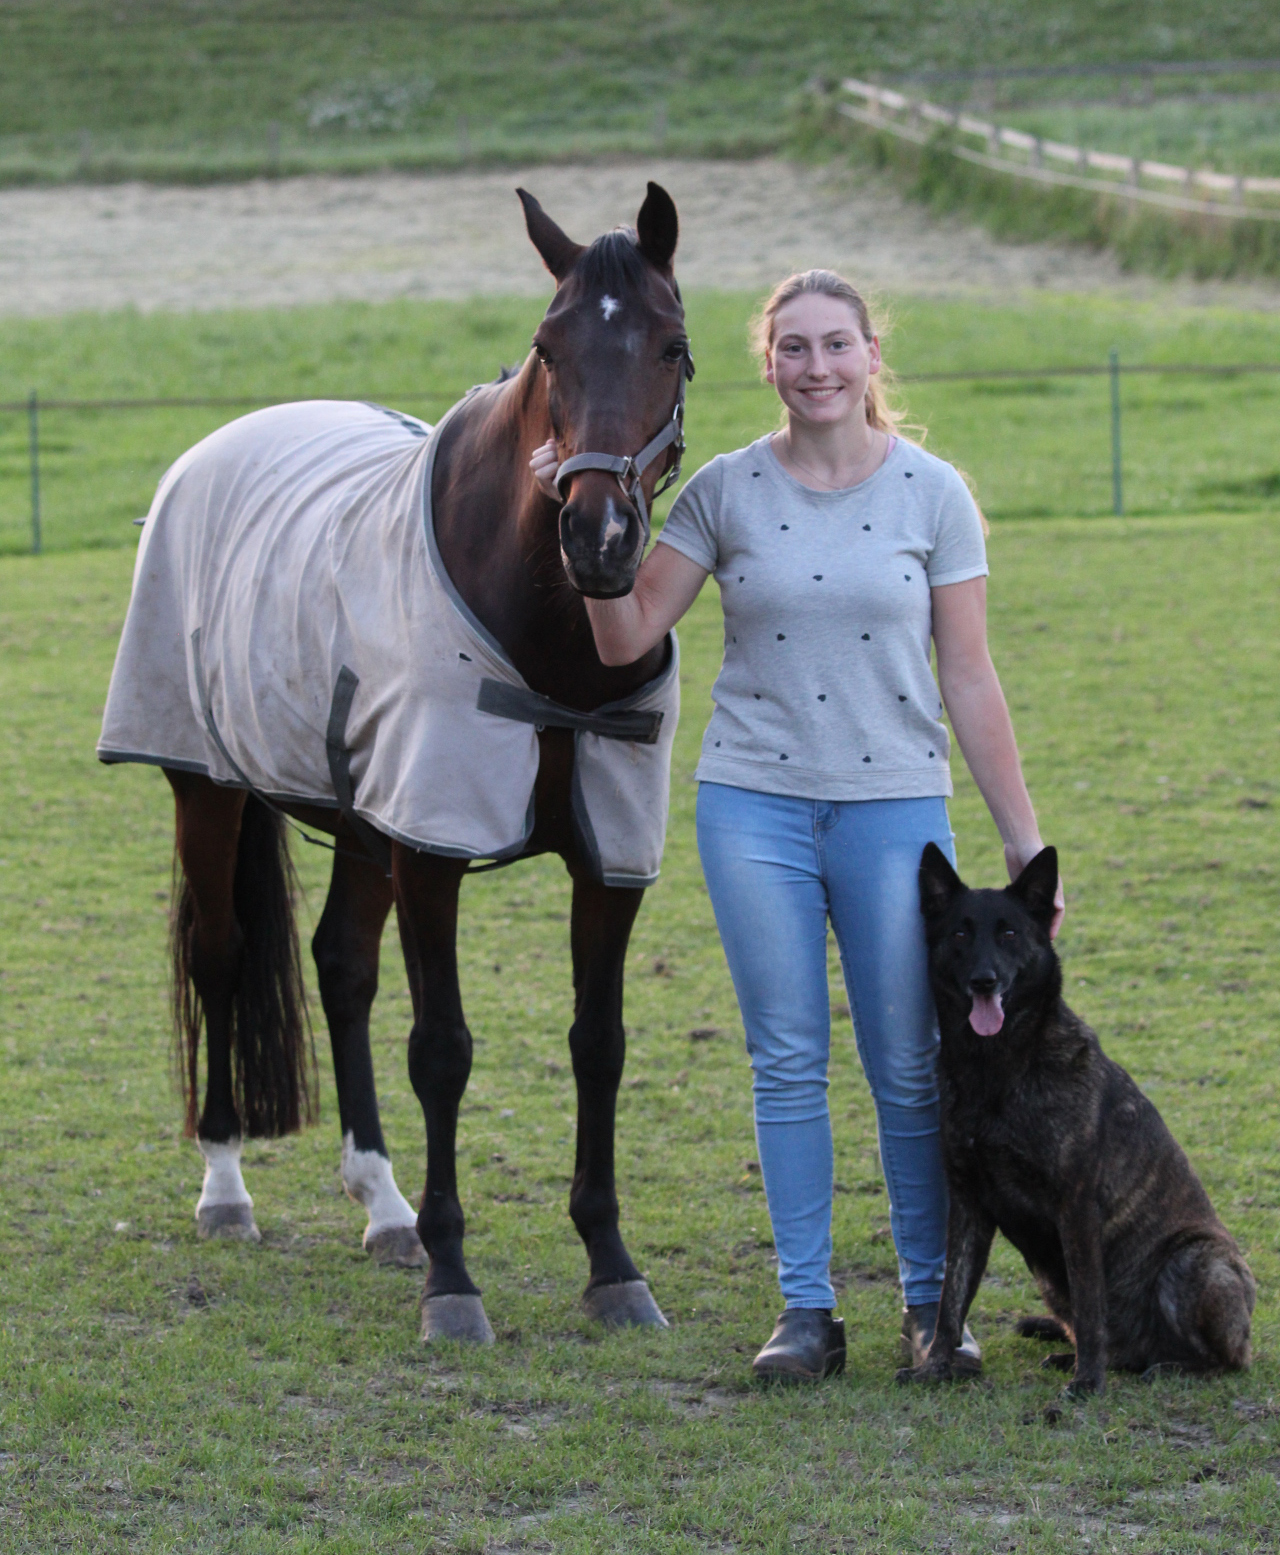 Dierenkliniek Tiel-Drumpt: Lisanne is onze paraveterinair uit Randwijk